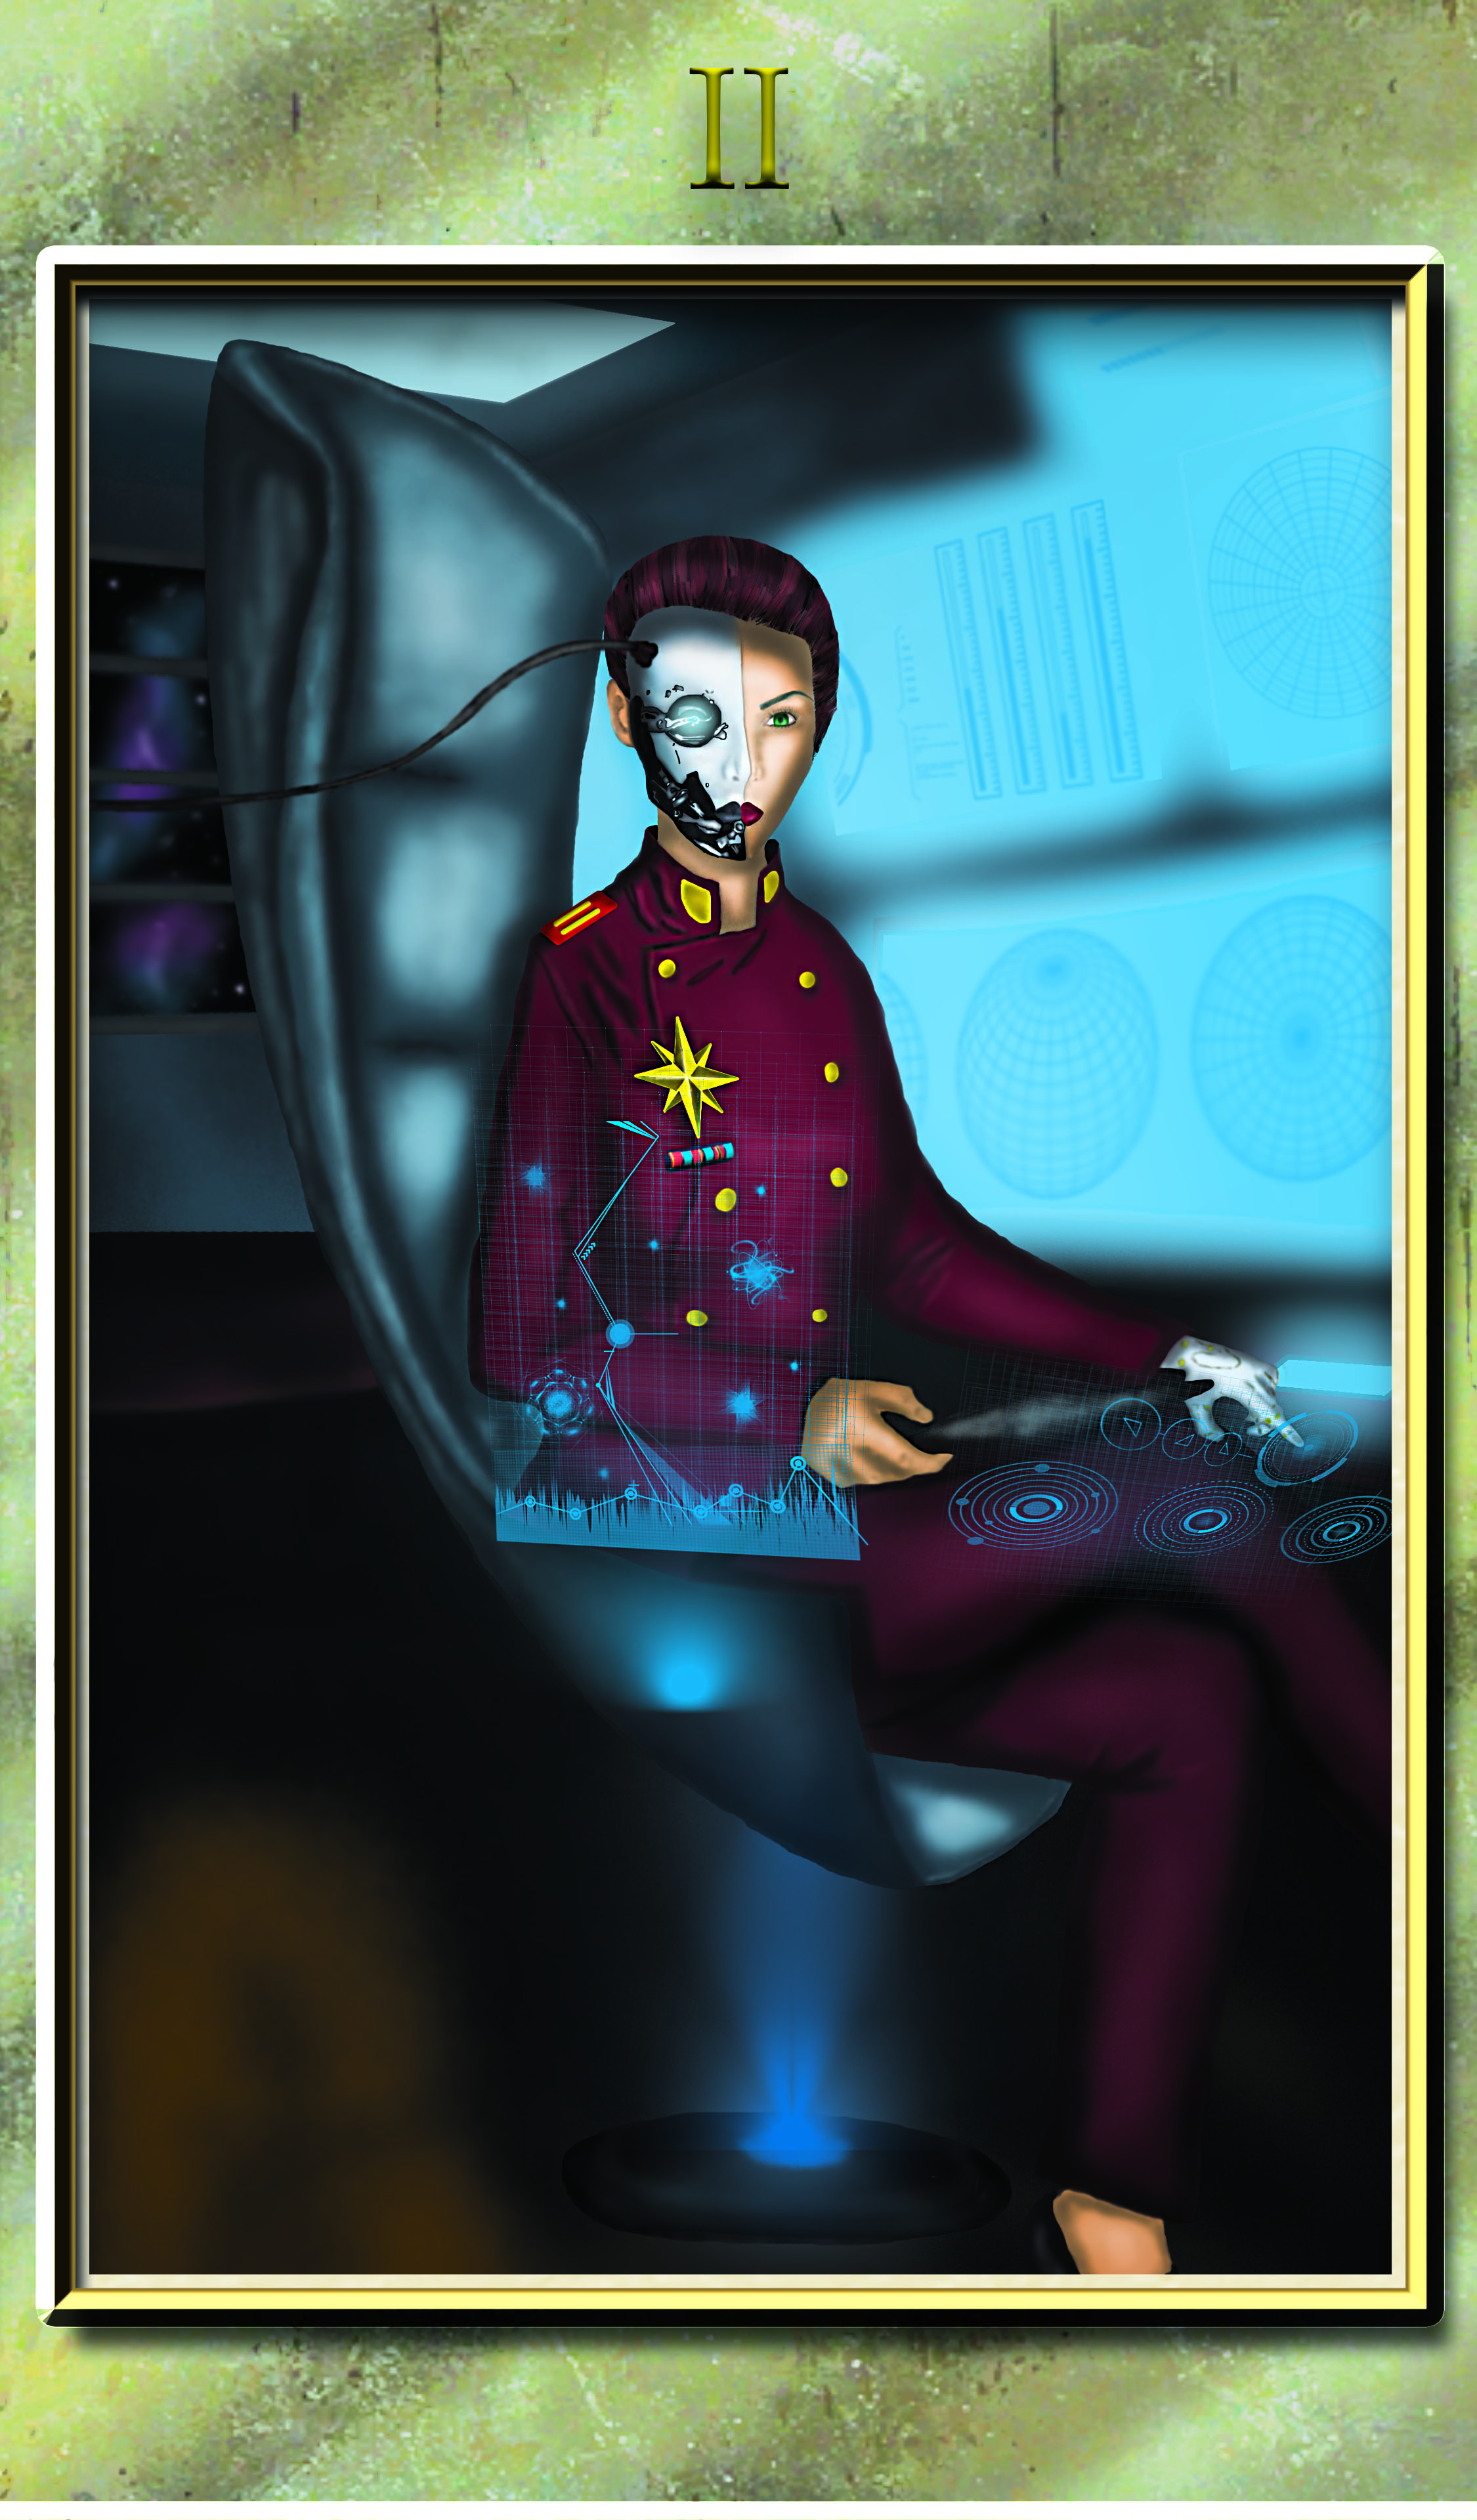 Ищем художника для создания колоды Таро в стиле киберпанк фото f_346590f9b5eaf9a3.jpg